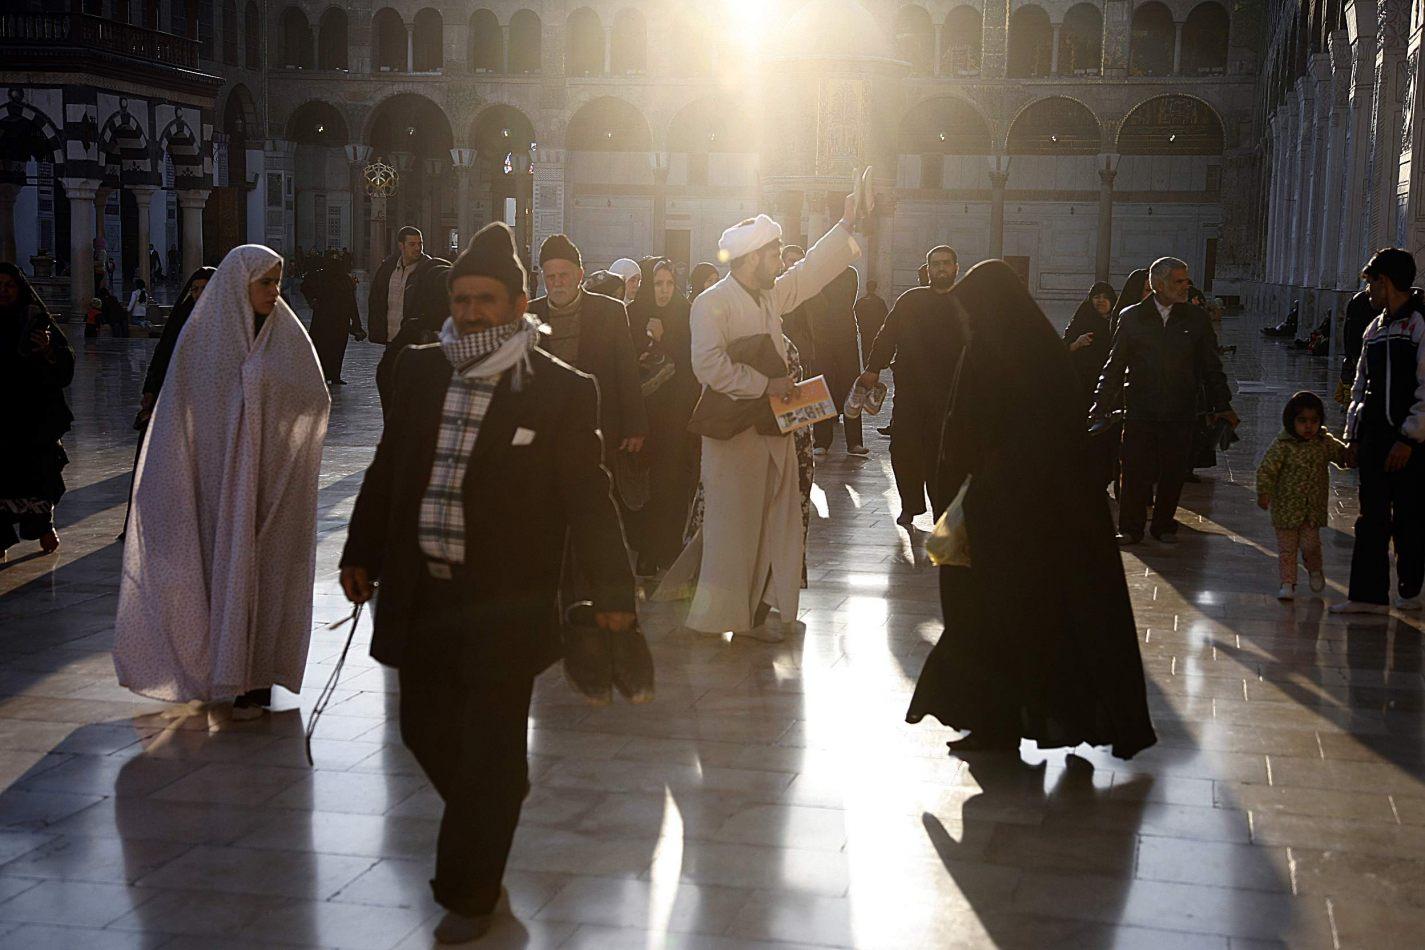 Anthony Ellis Photography: Shadows and Steps - Bilad al-Shams